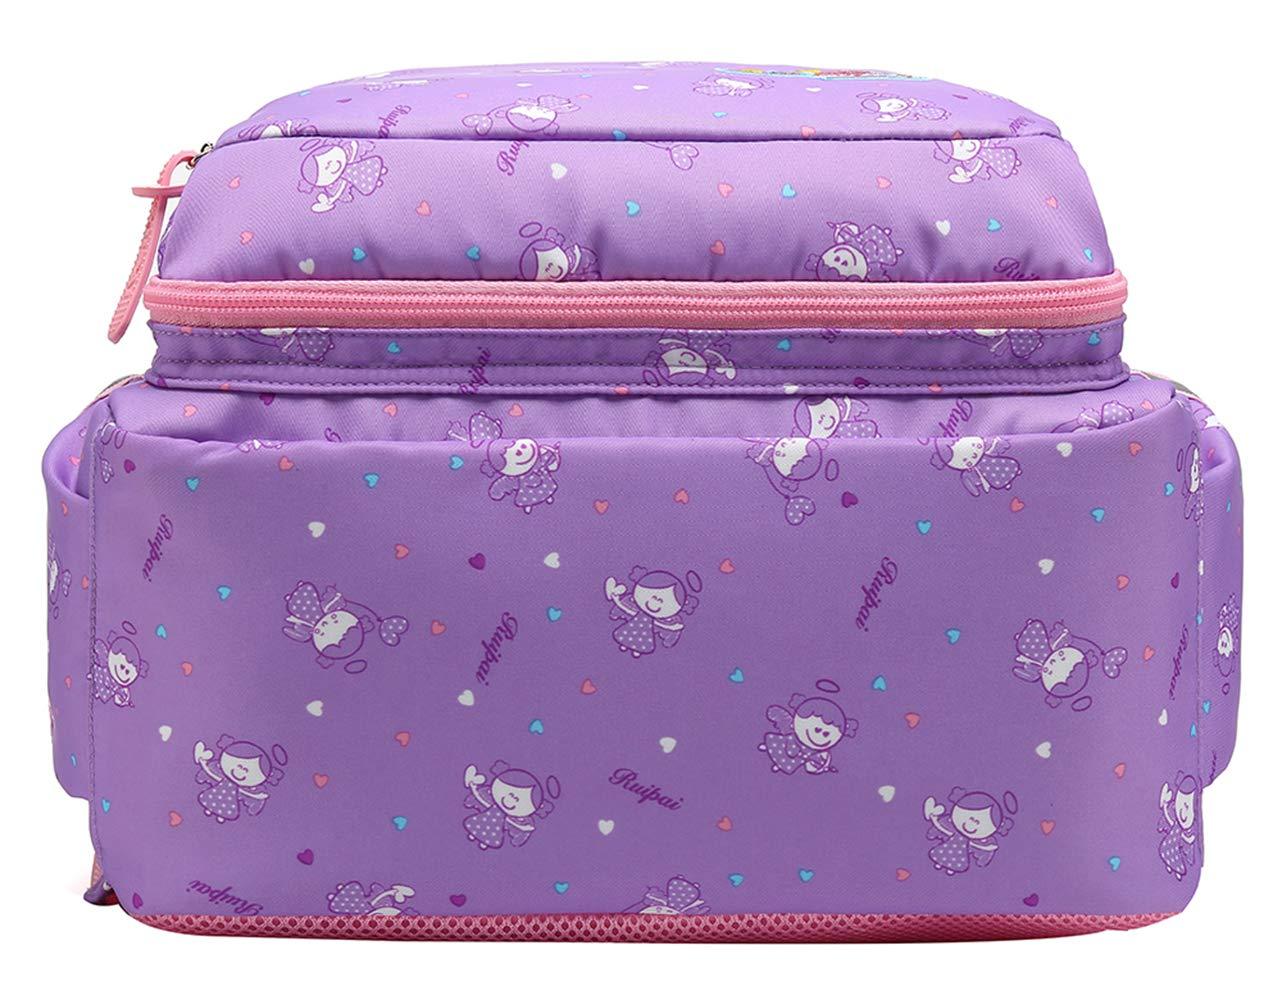 SellerFun UKXB106 – Mochila Infantil Niños, 16 L Style B Purple (Morado) – UKXB426B2